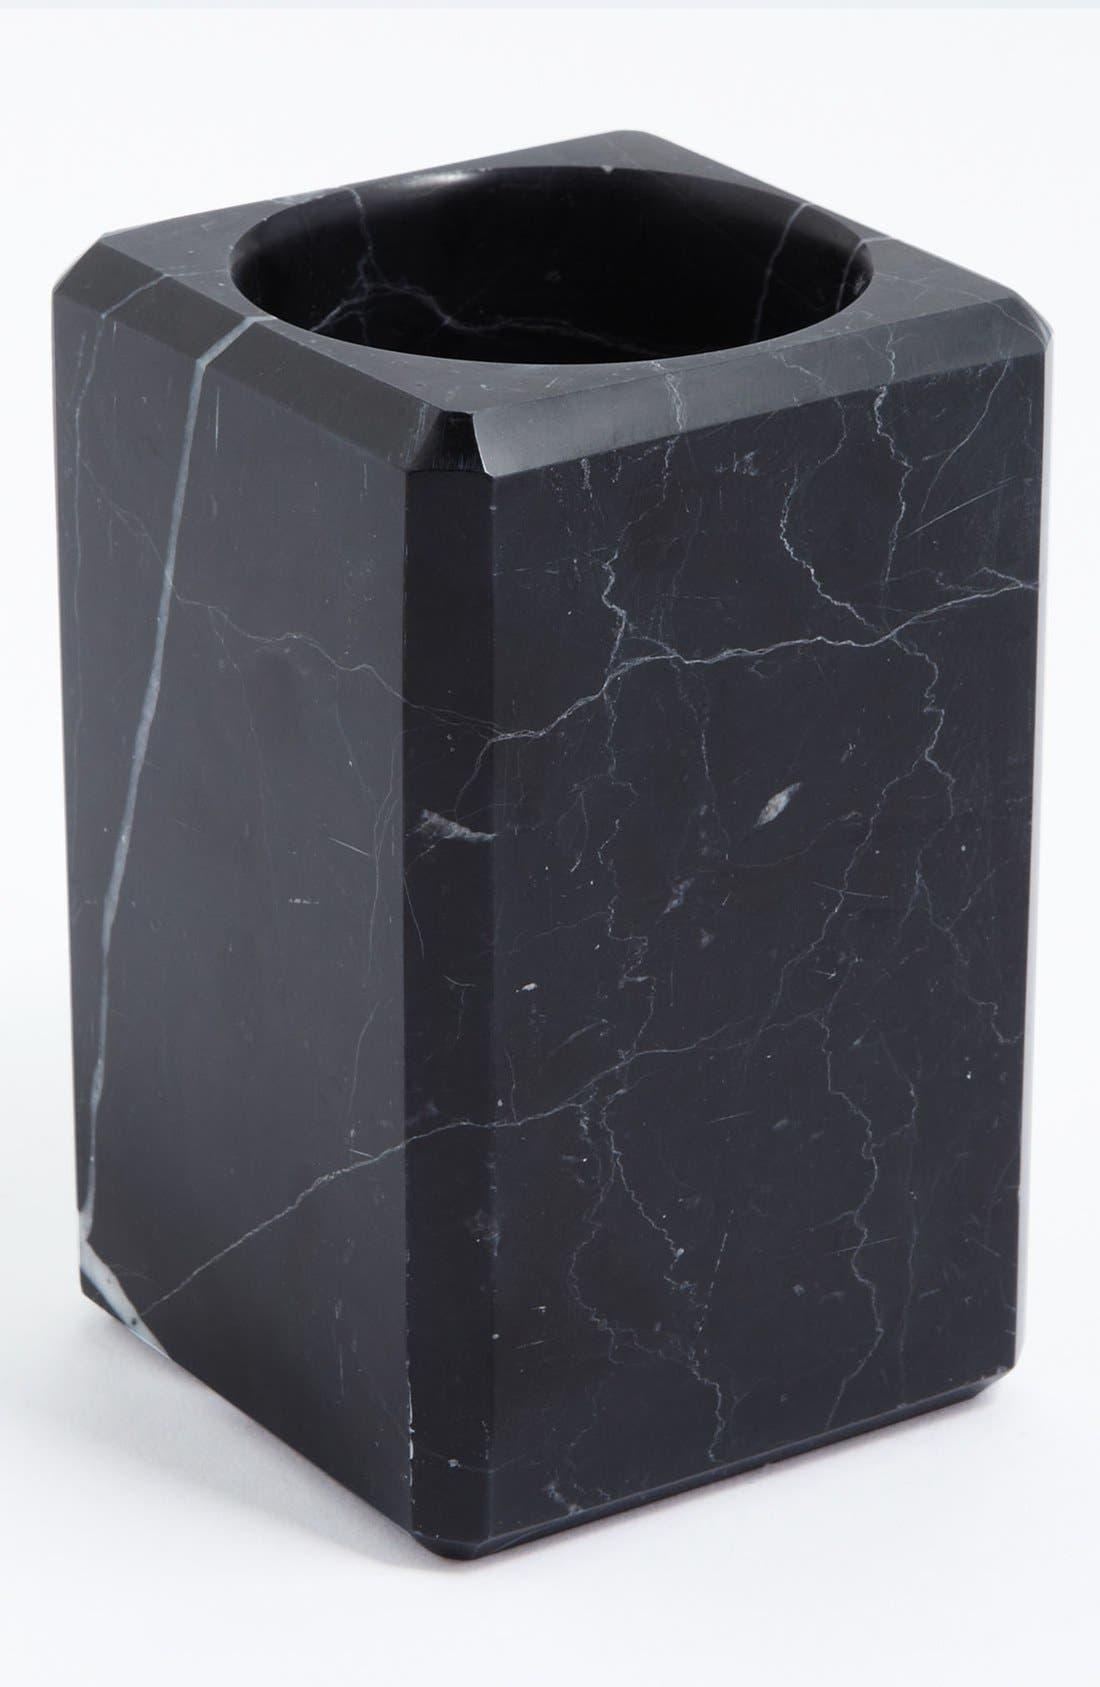 Main Image - Waterworks Studio 'Luna' Black Marble Tumbler (Online Only)